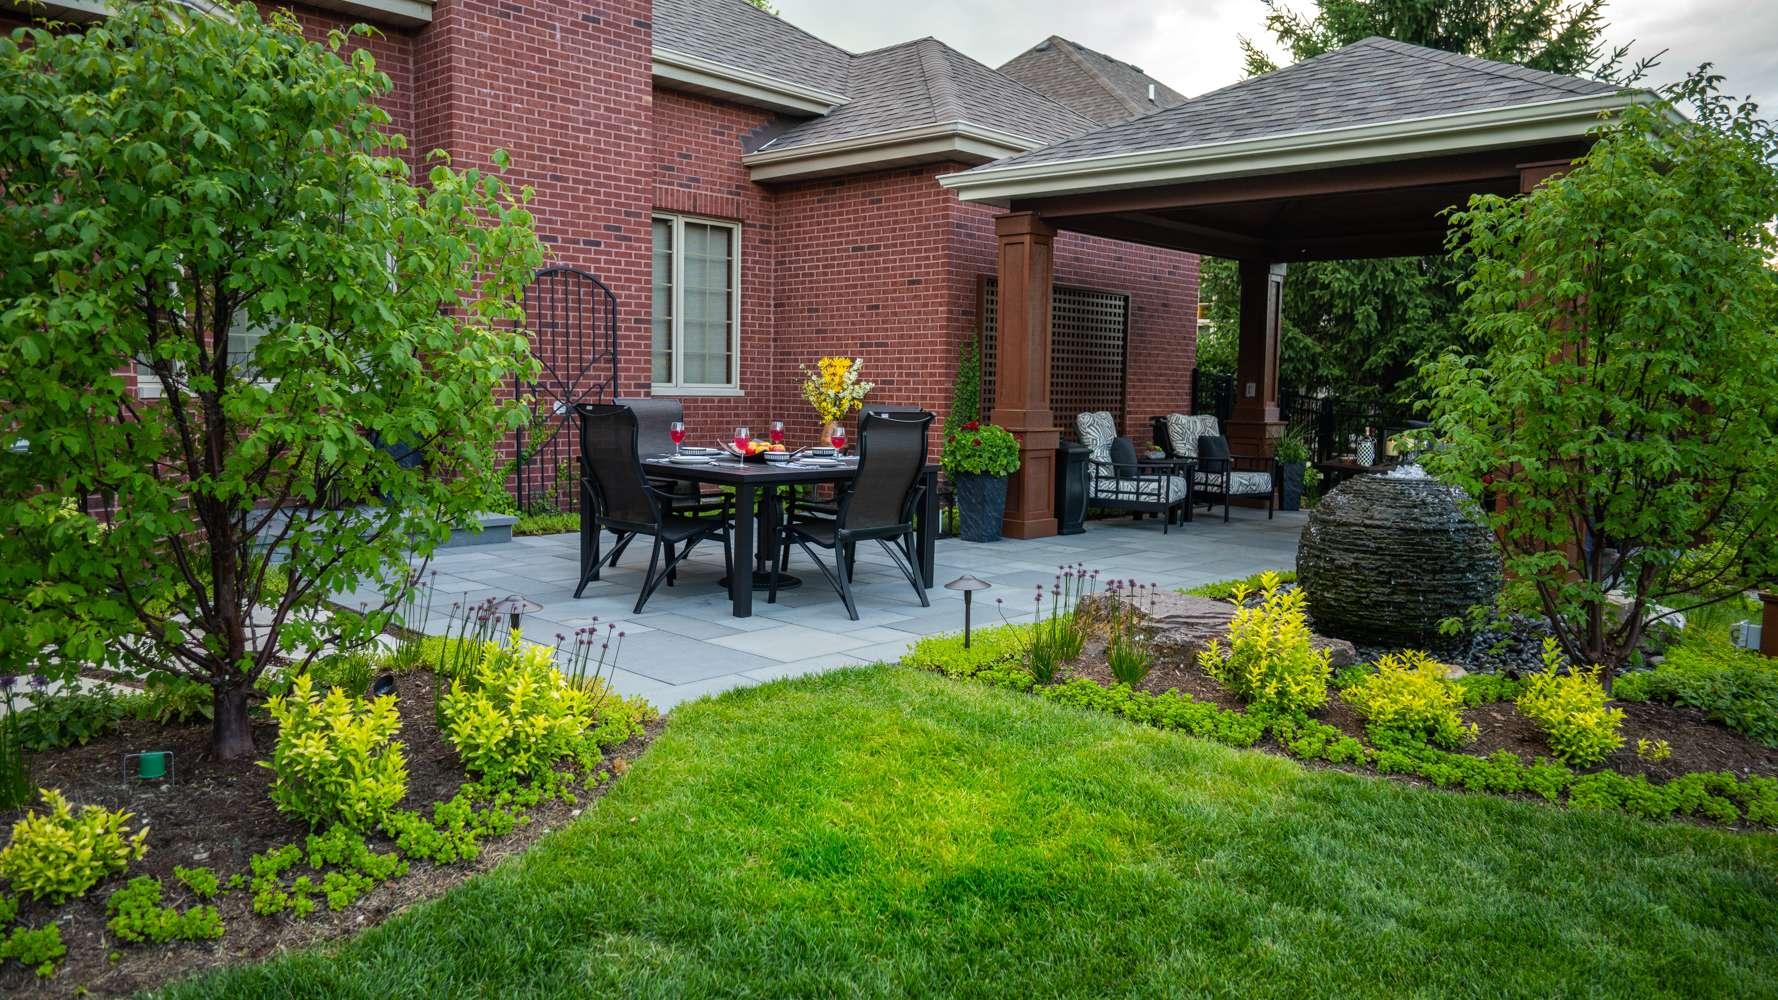 5 Backyard Landscape Design Ideas for Naperville, IL Homeowners